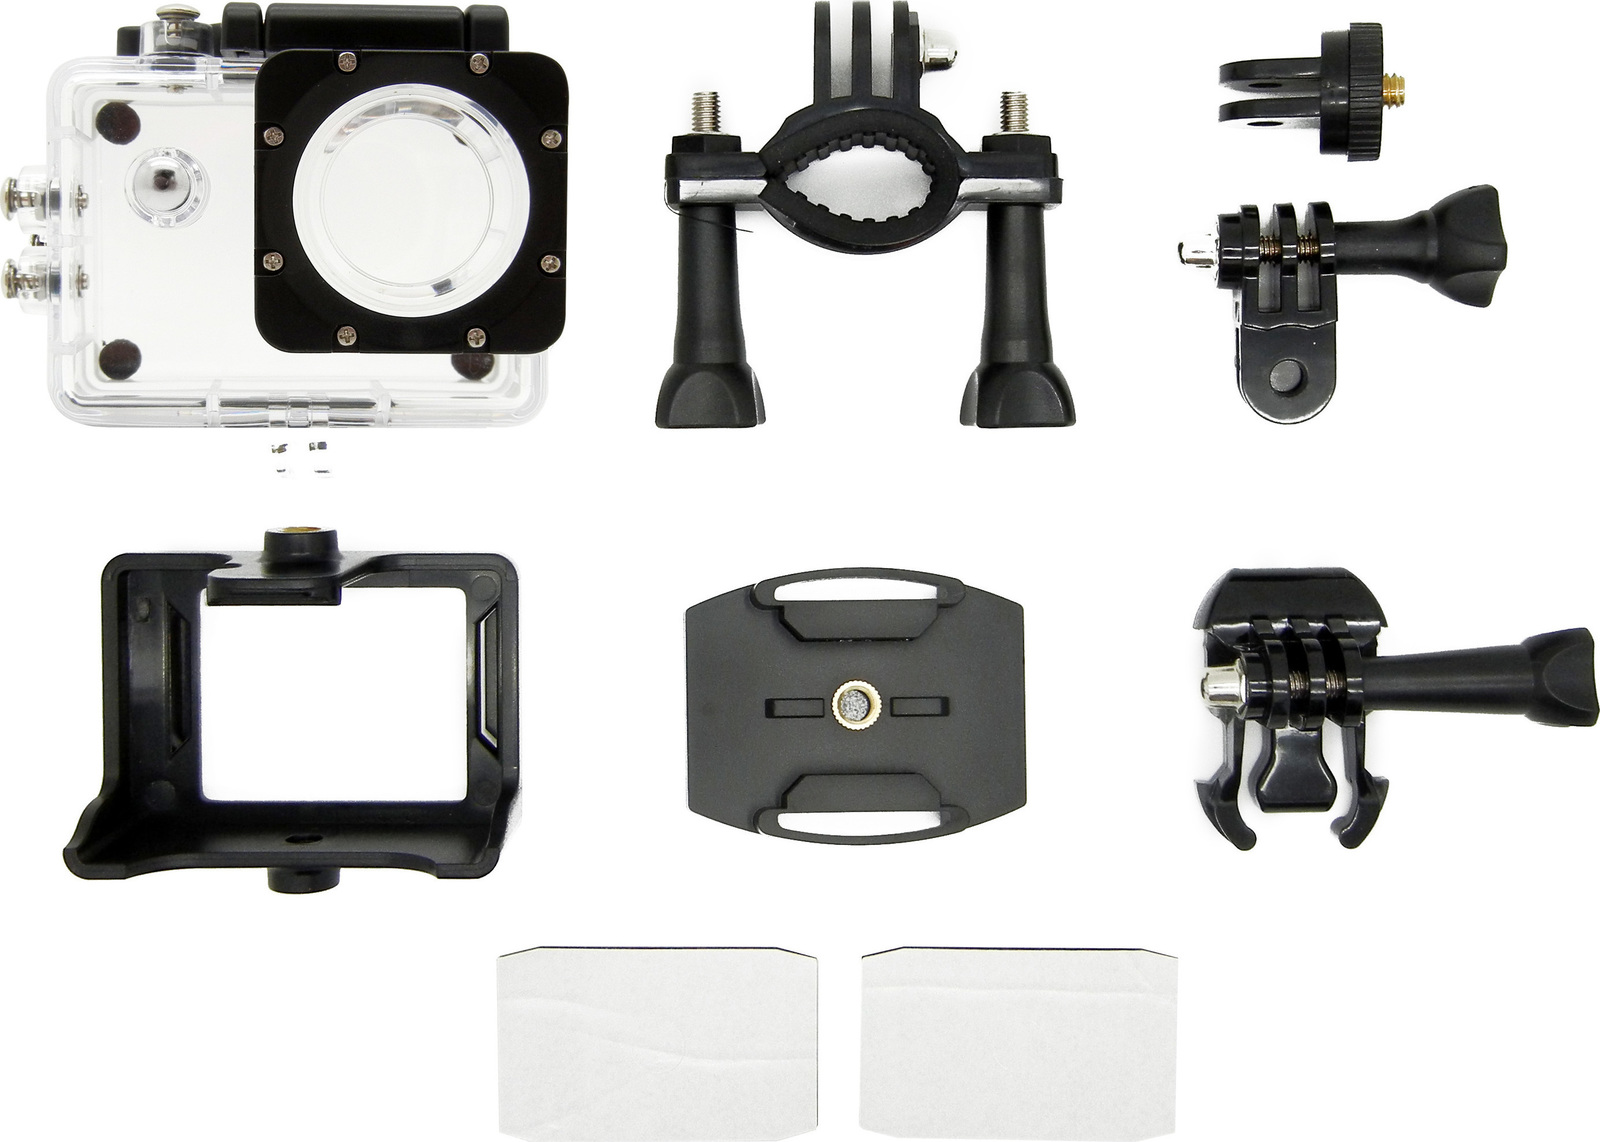 Panox MX200 EasyPix Camera